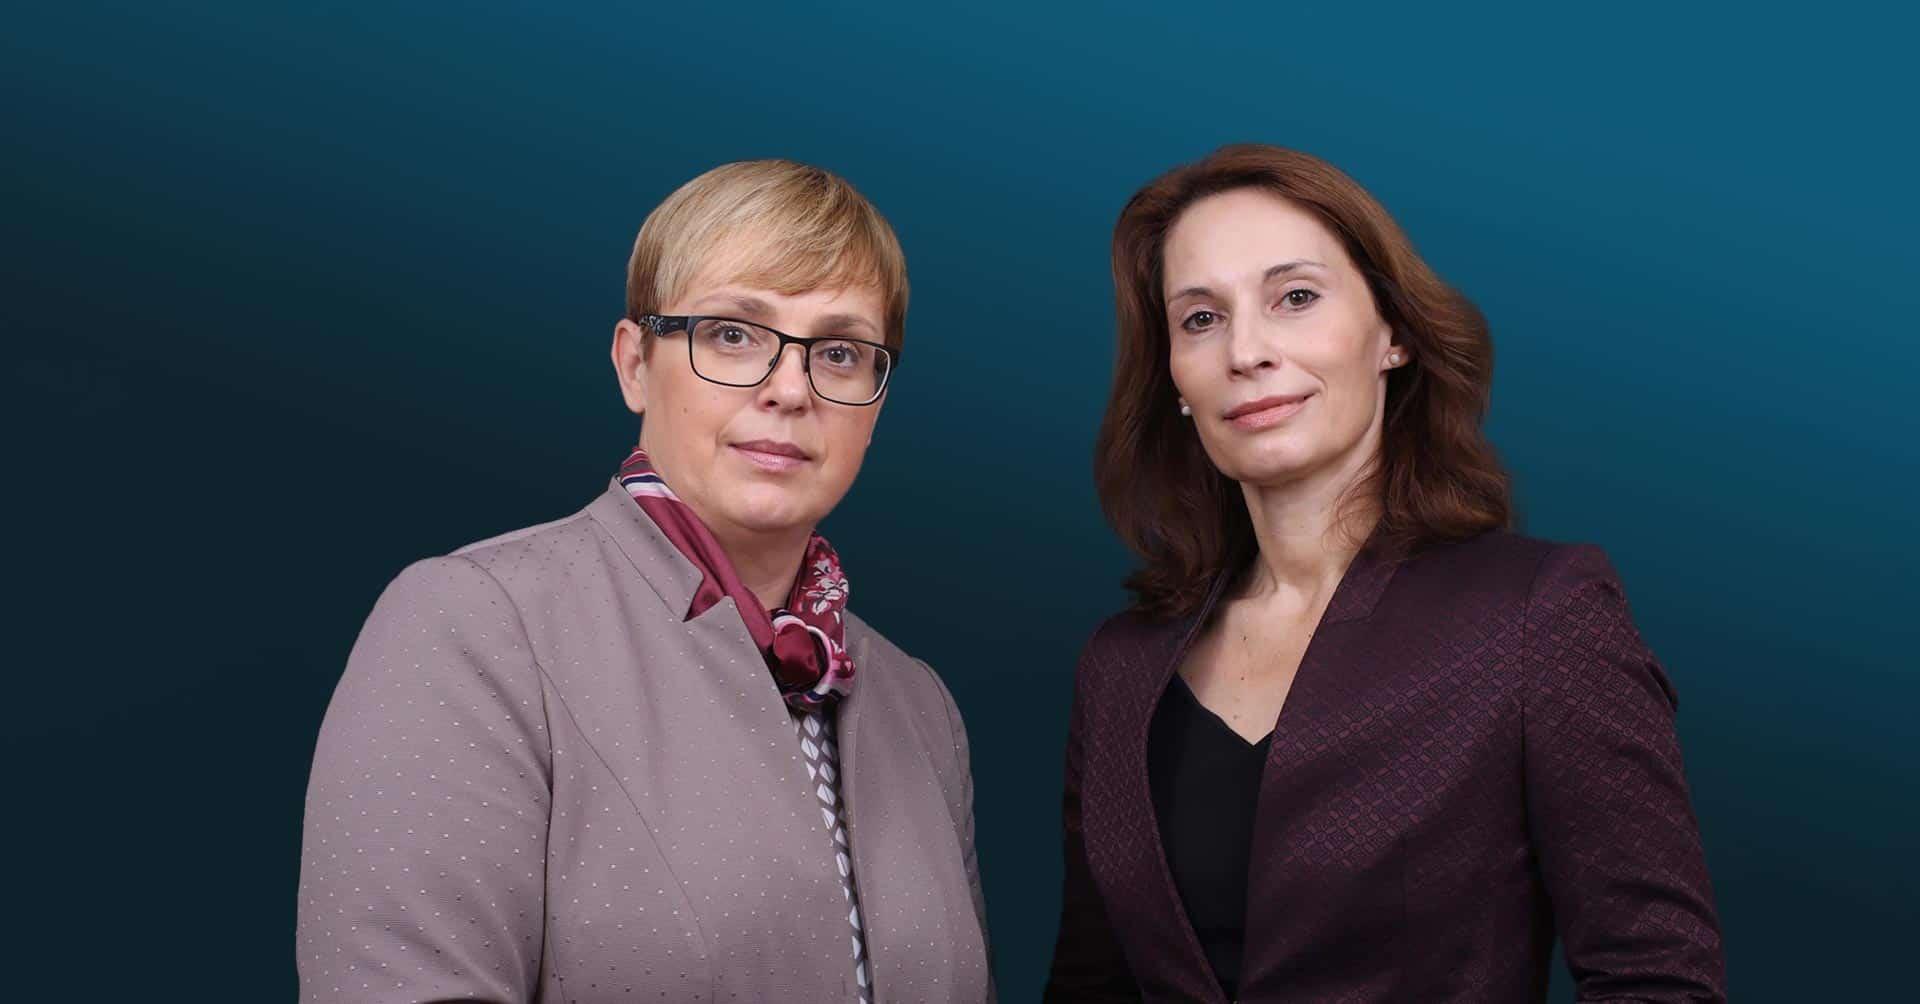 Odvetnici Pirc Musar & Lemut Strle